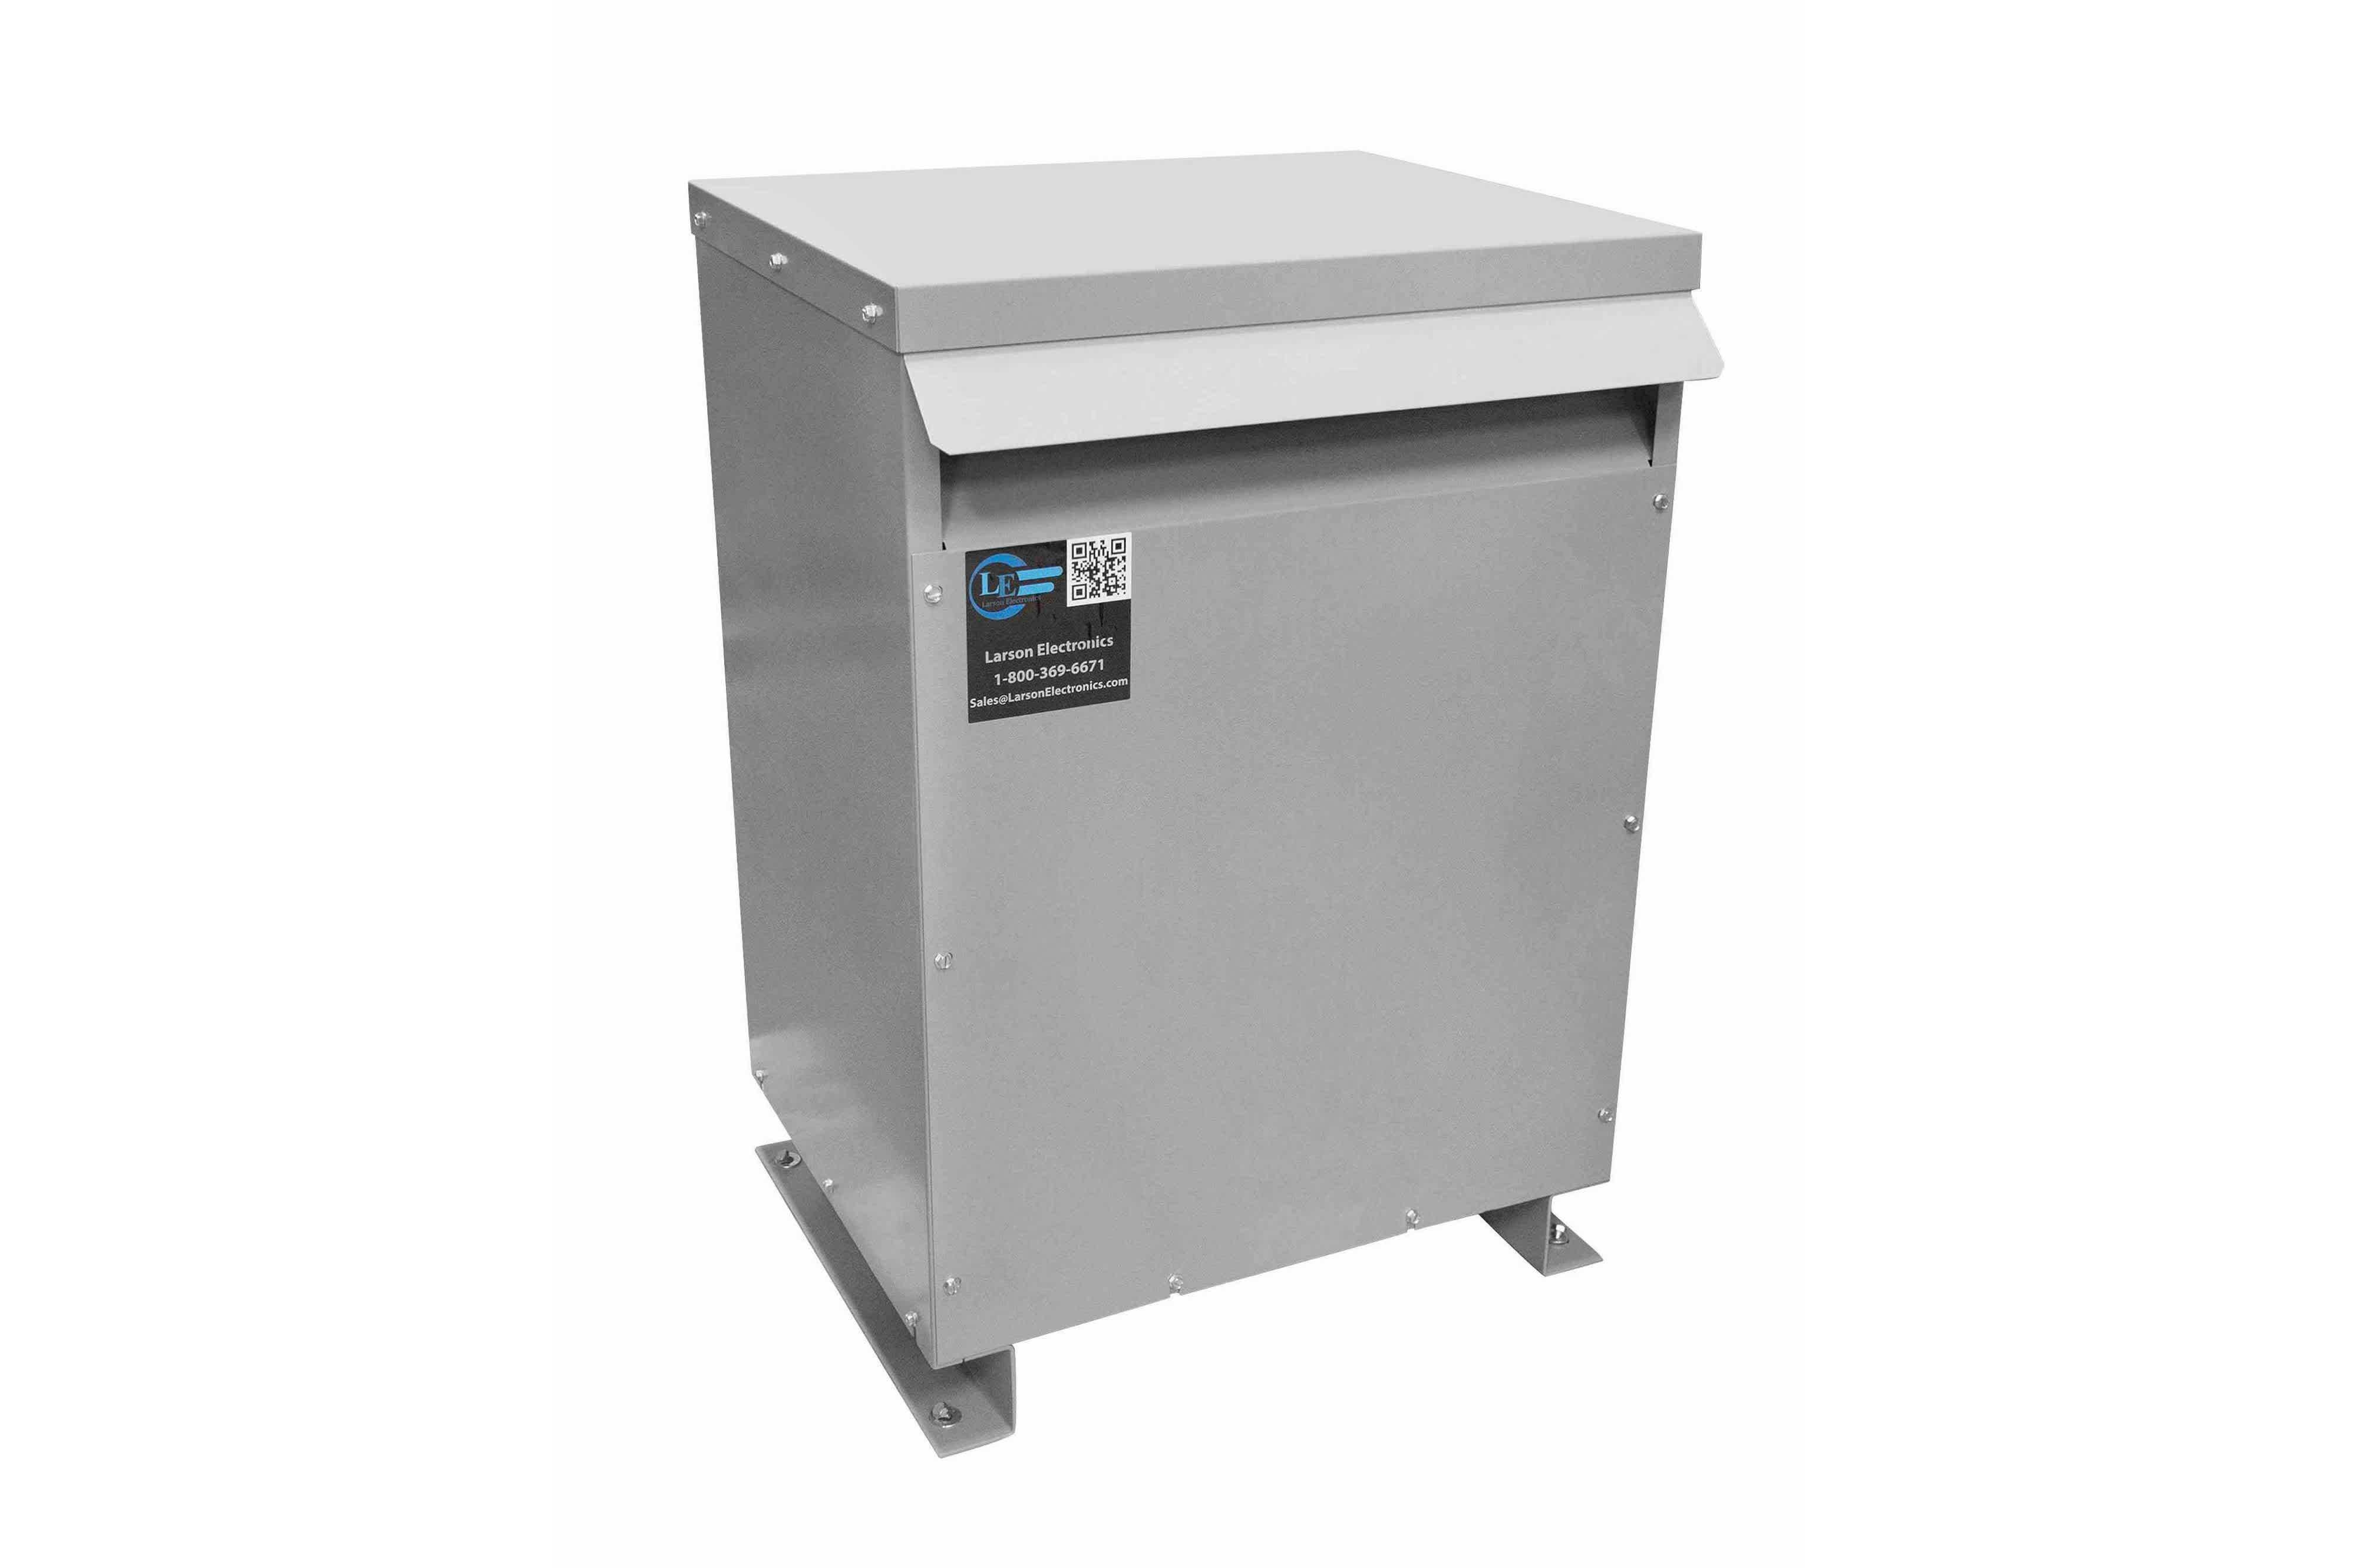 150 kVA 3PH Isolation Transformer, 460V Wye Primary, 415Y/240 Wye-N Secondary, N3R, Ventilated, 60 Hz